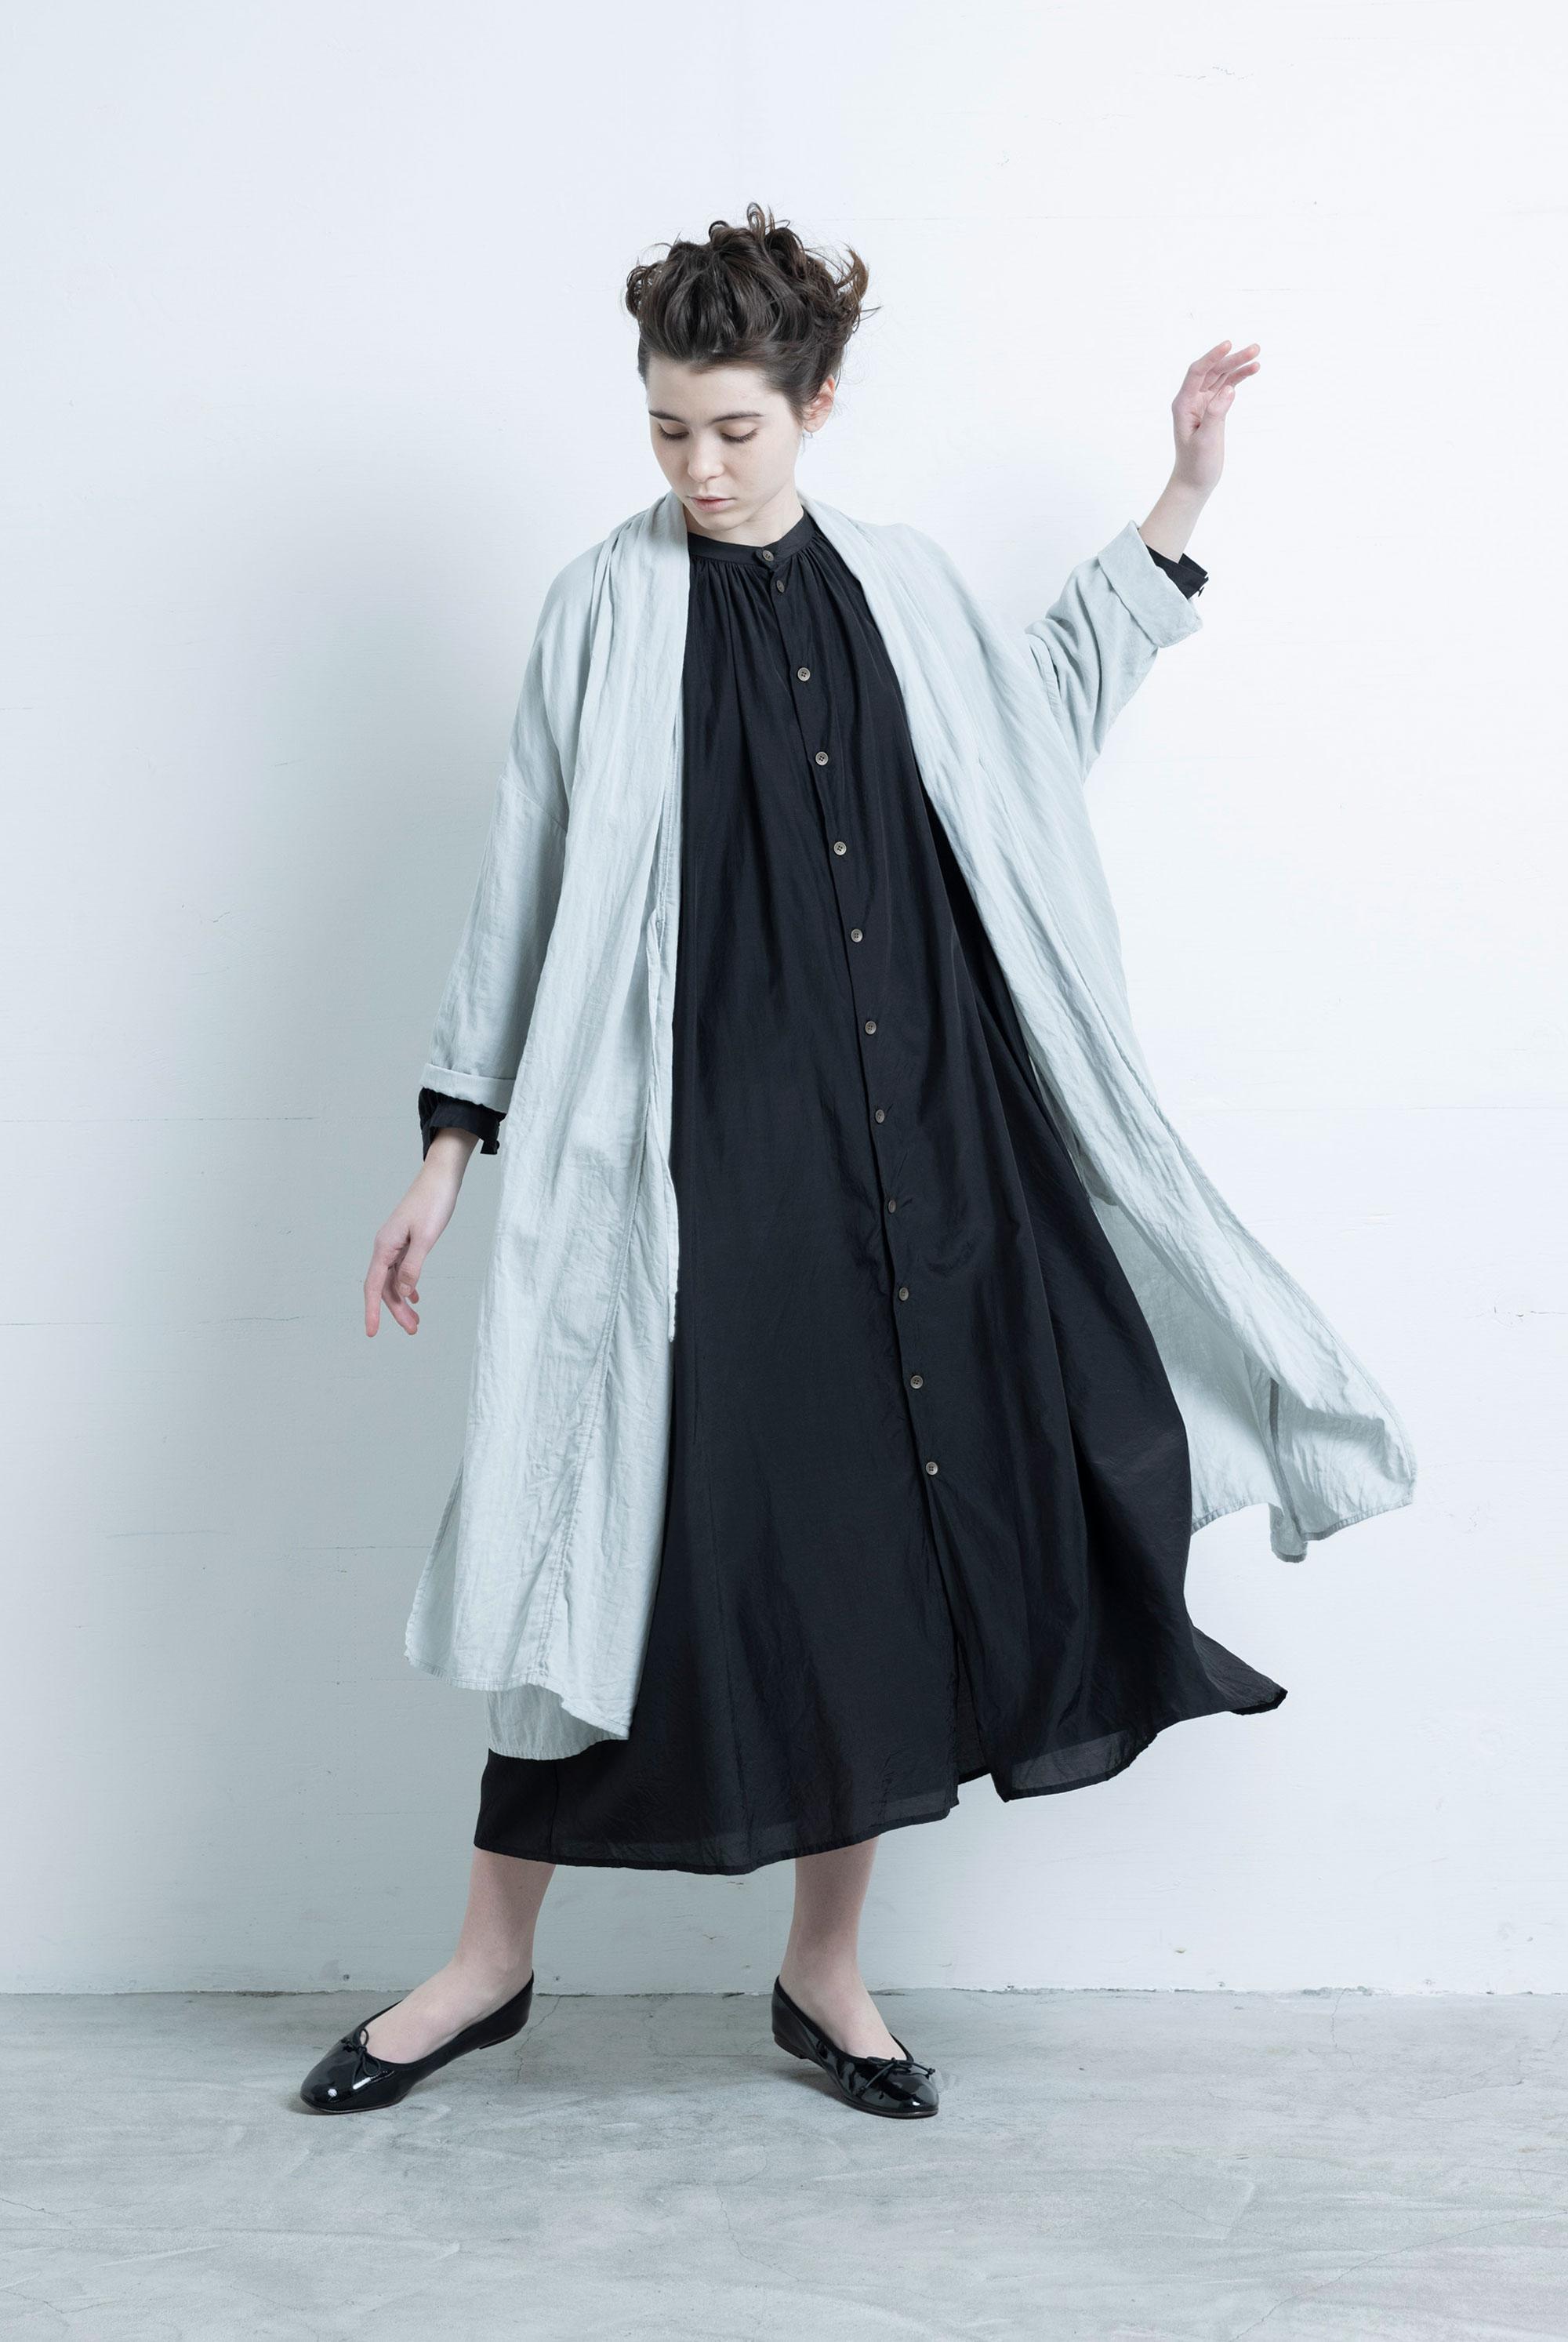 robe de peau 2021 S/S image